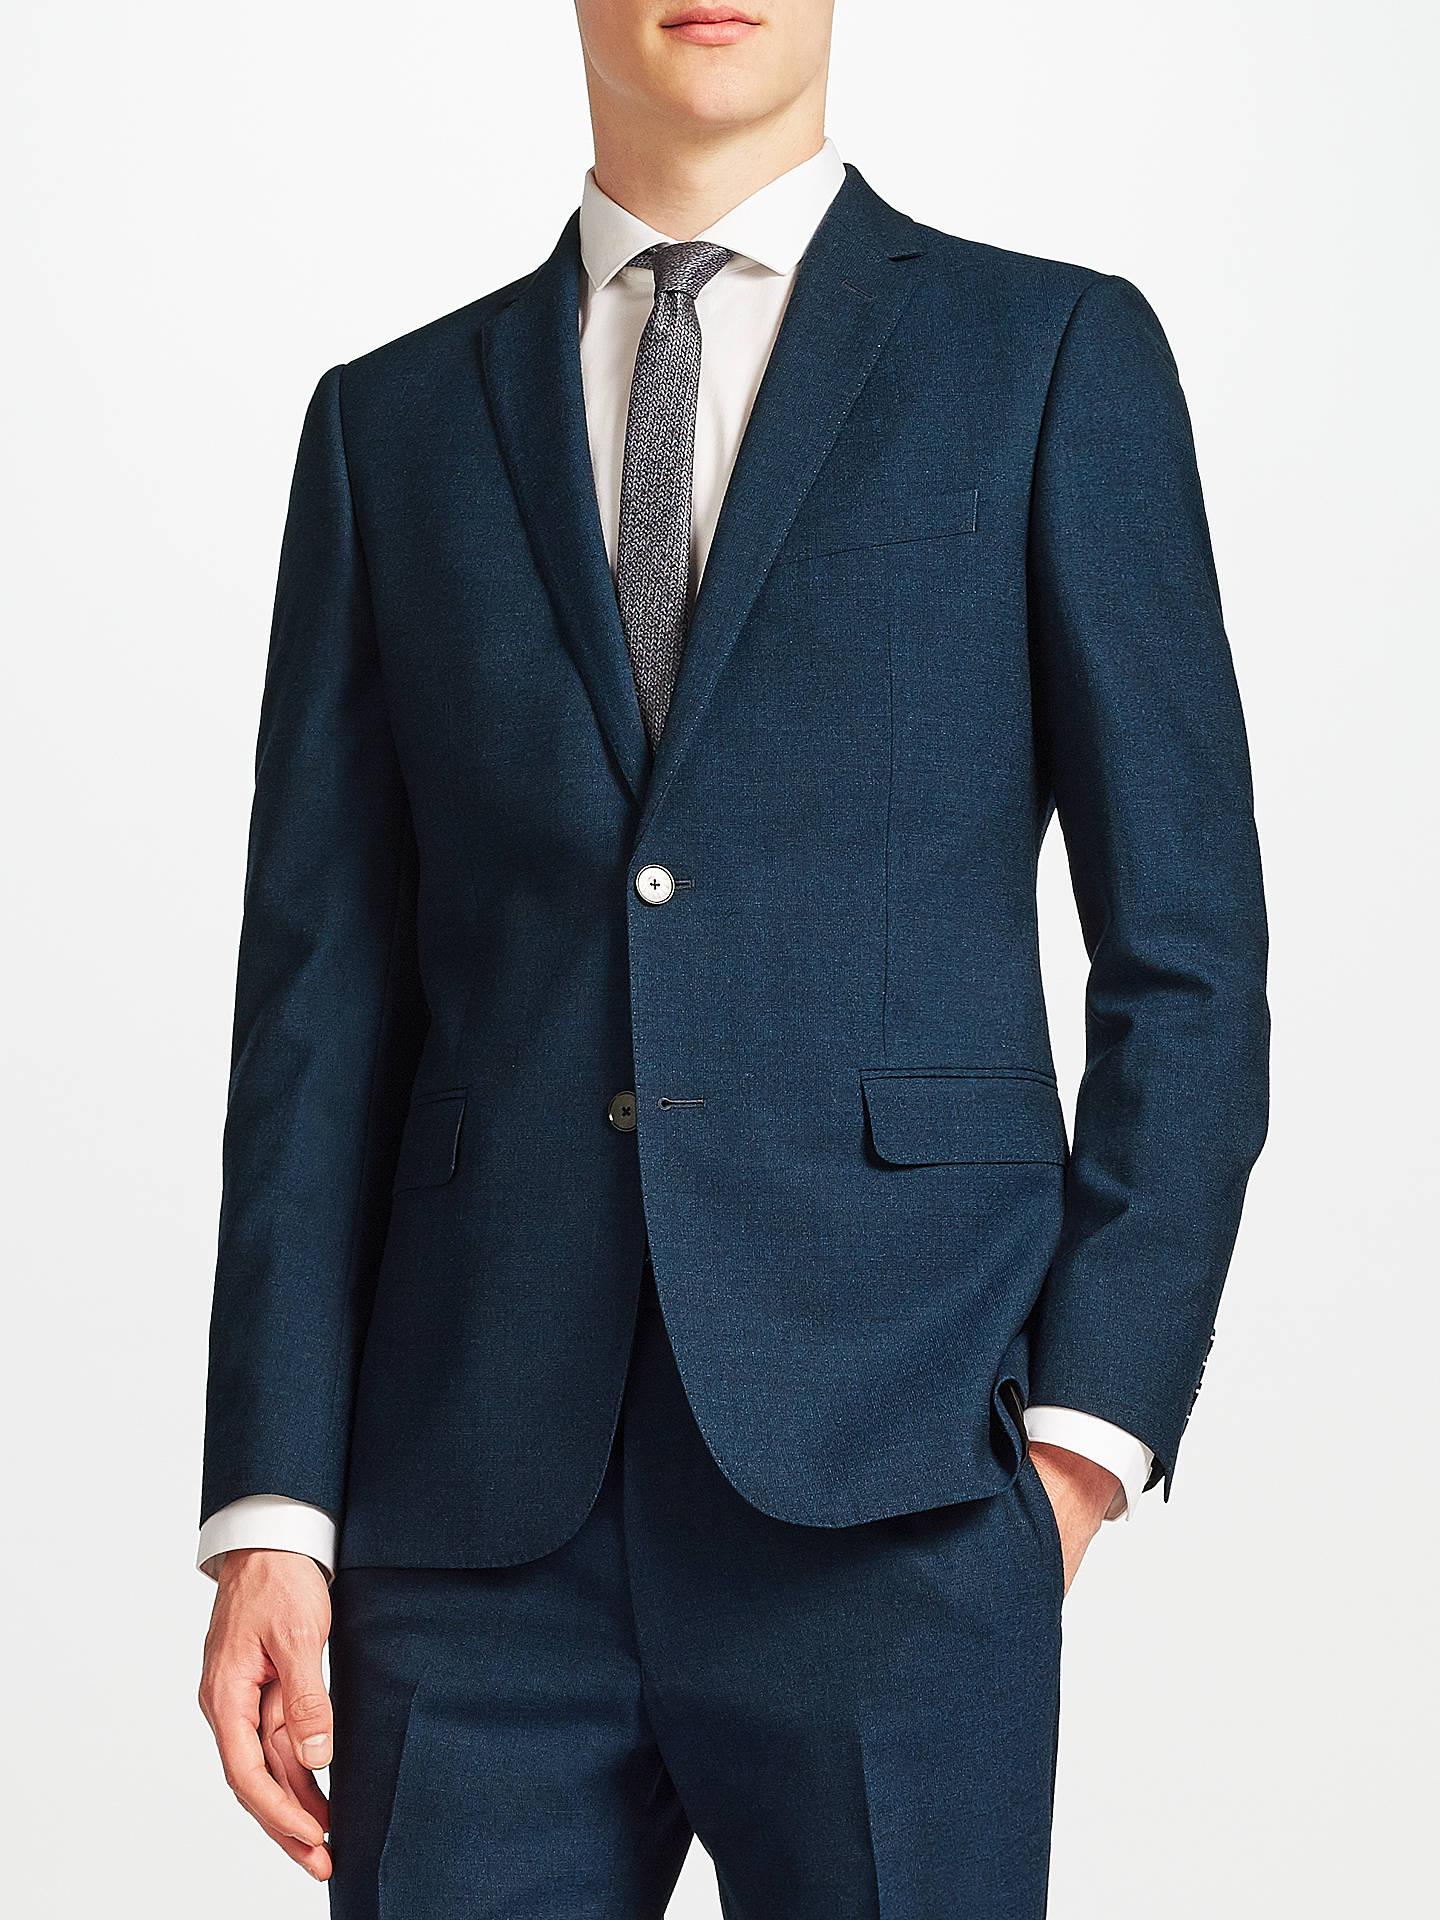 a6194fd4a21 Buy Kin Levy Slim Fit Suit Jacket